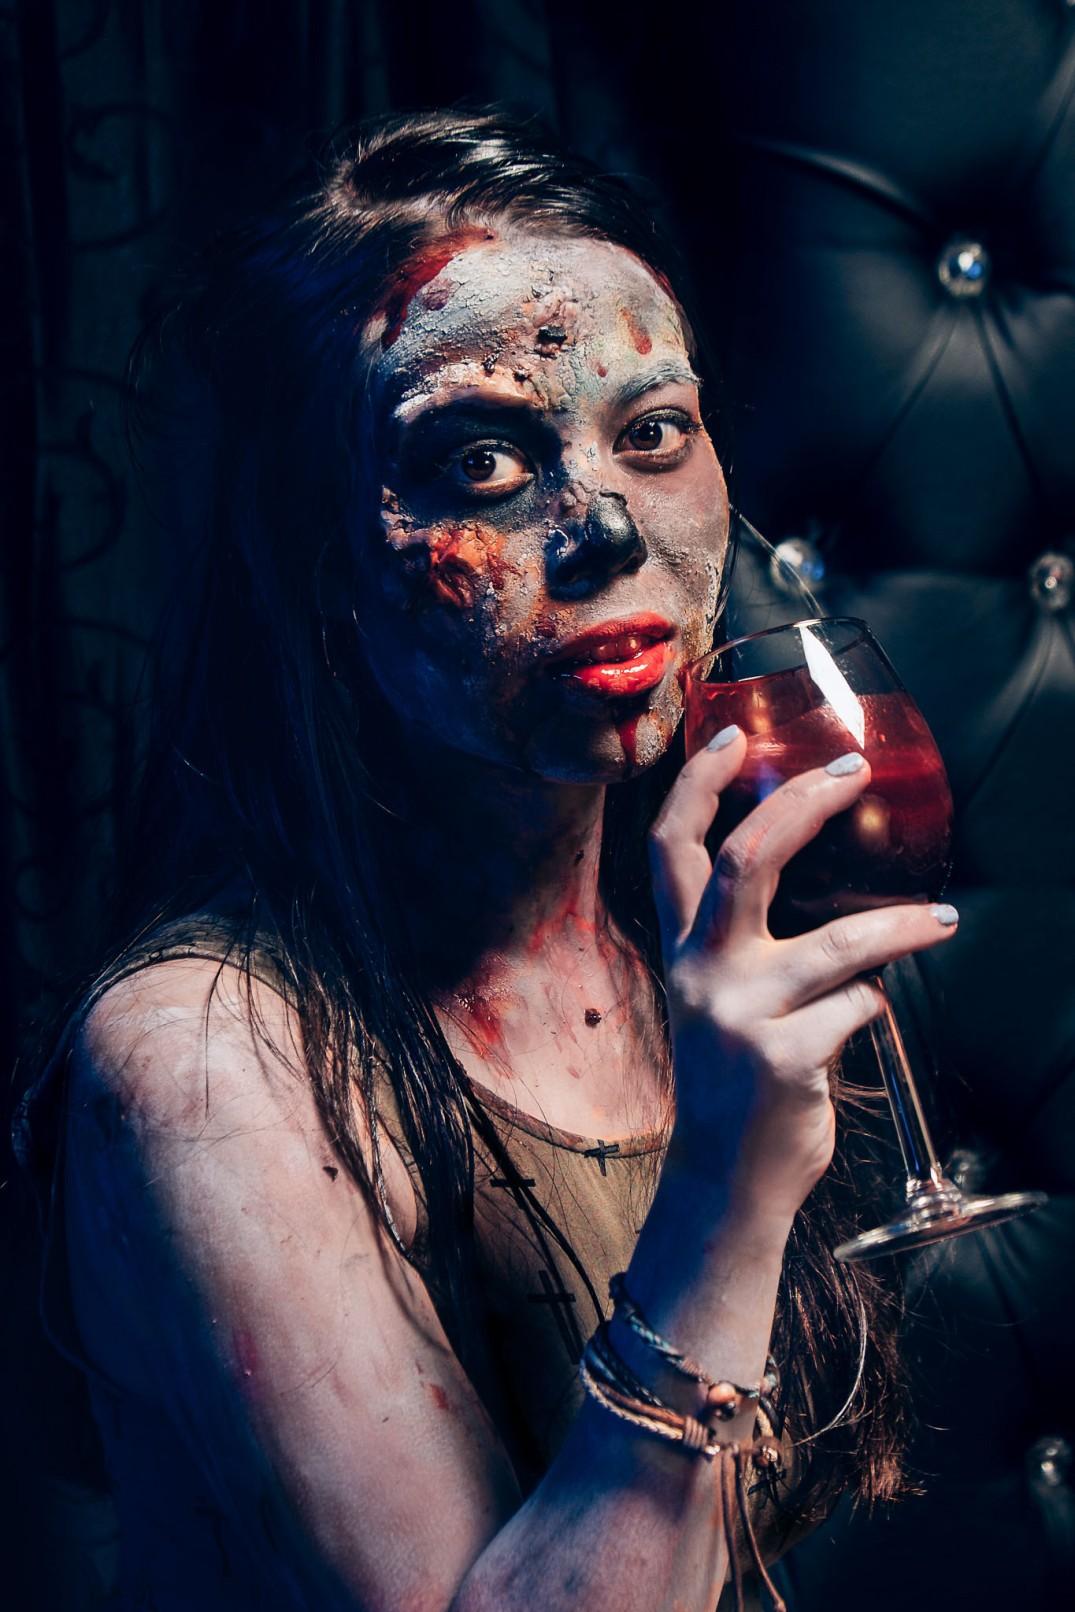 Horror_LR-14